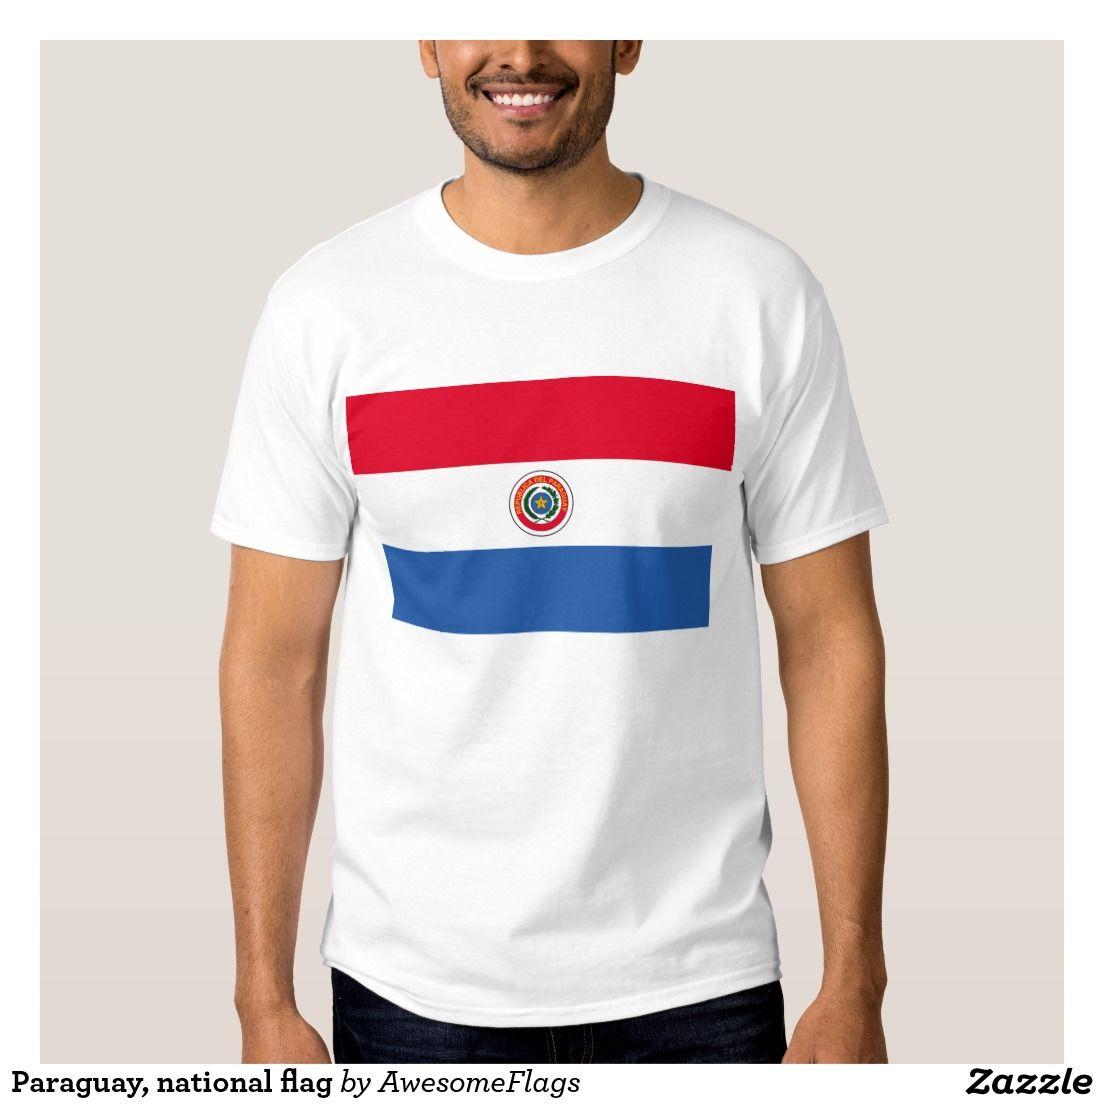 Paraguay, national flag